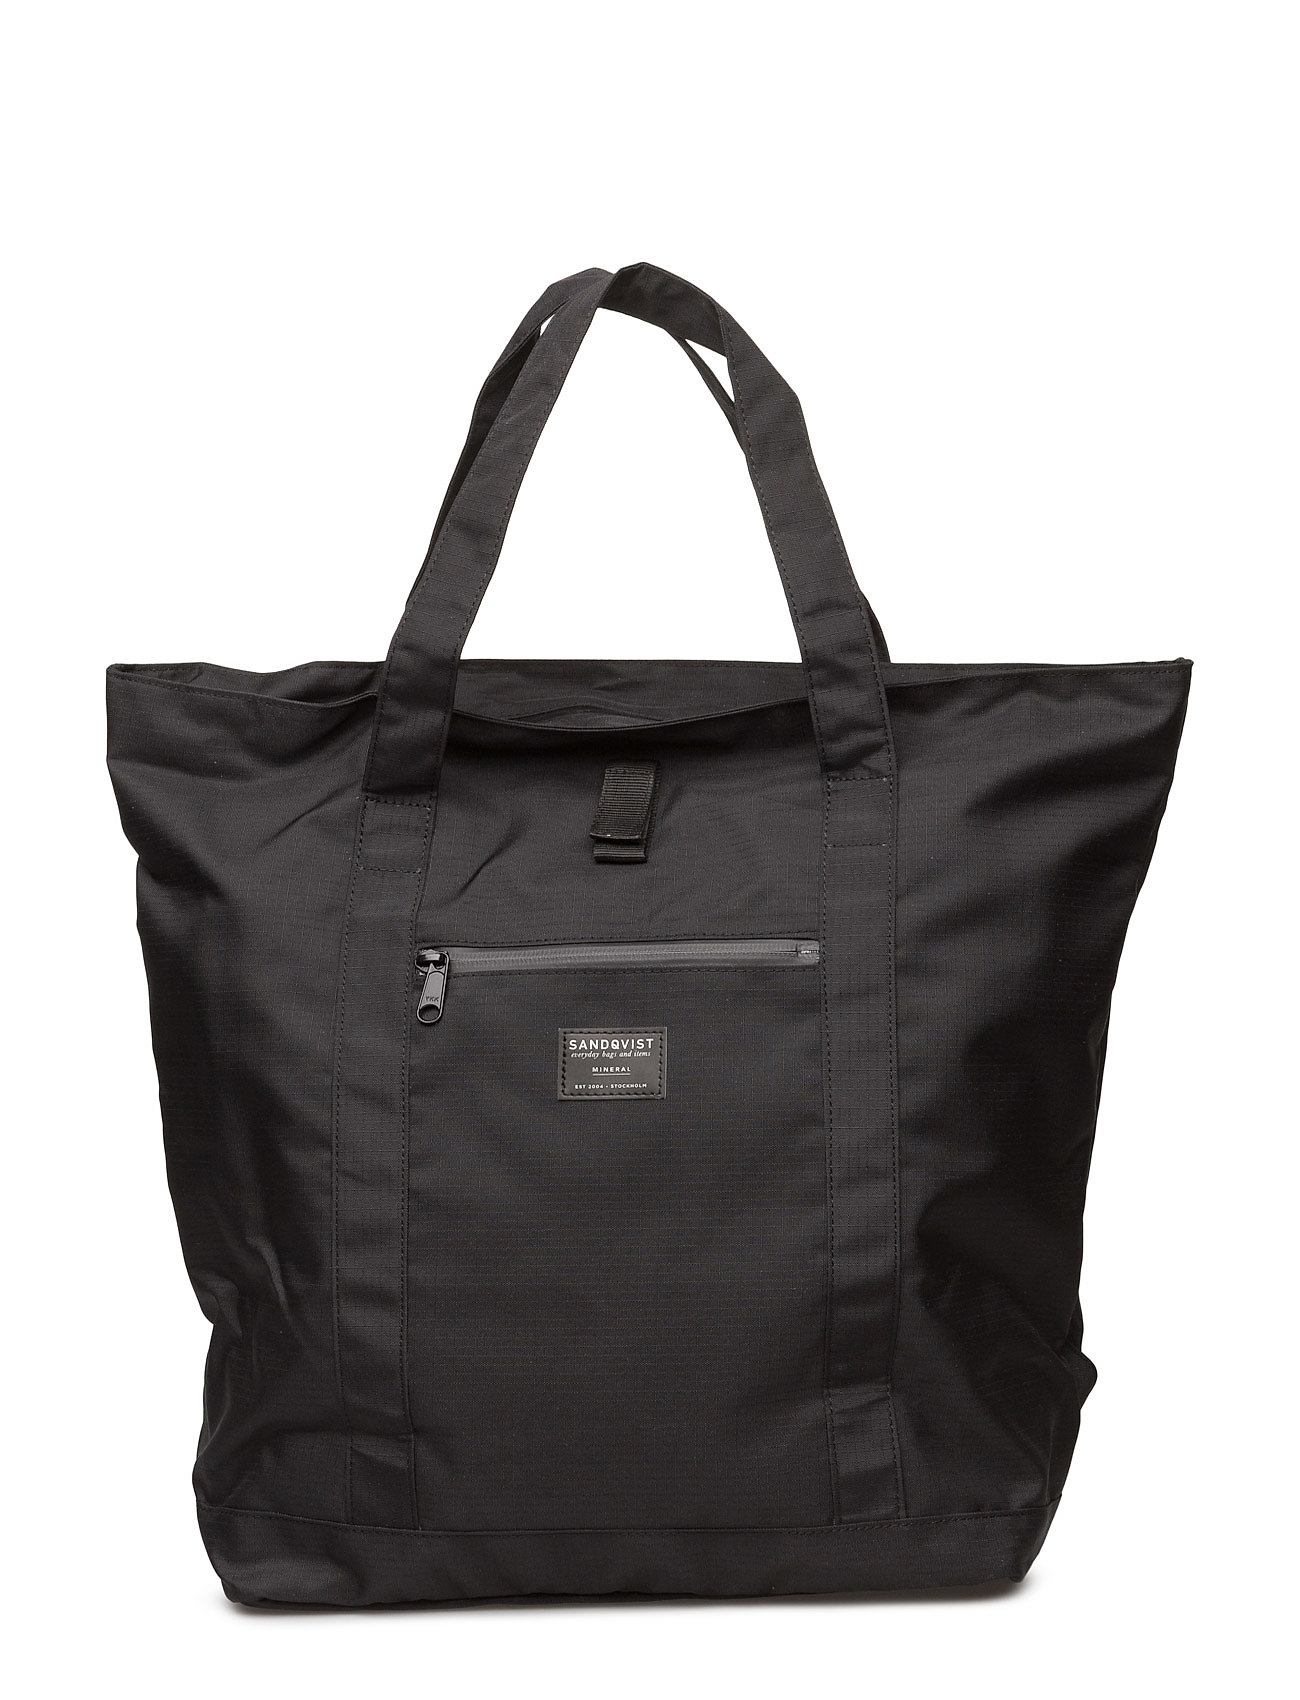 Max SANDQVIST Shopper tasker til Damer i Sort